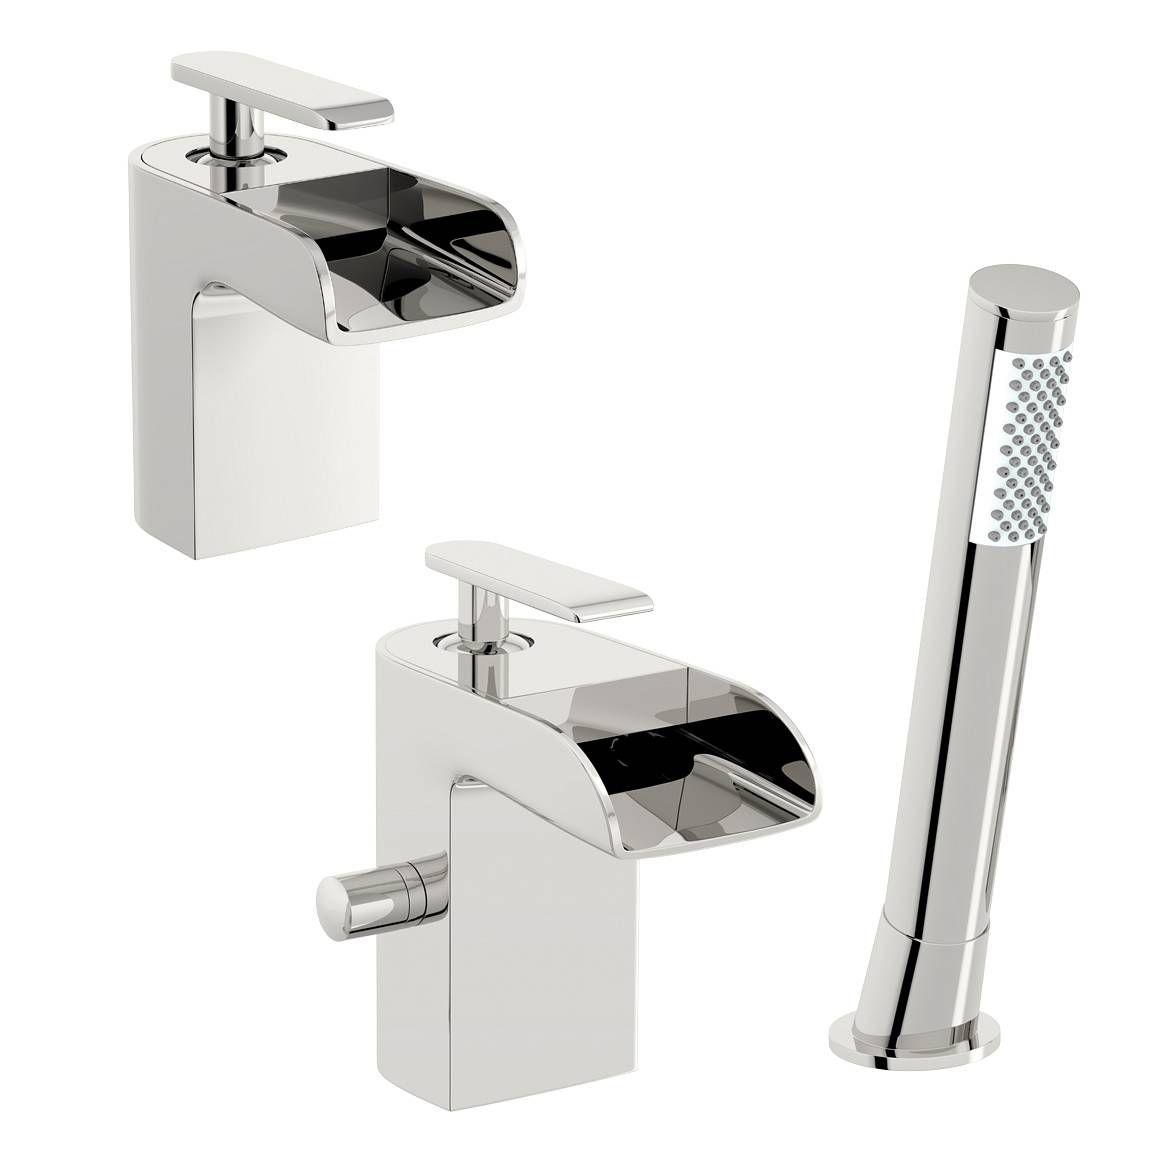 Reinosa Basin And Bath Shower Mixer Pack Victoria Plumb Bath Shower Mixer Bath Shower Mixer Taps Mixer Taps